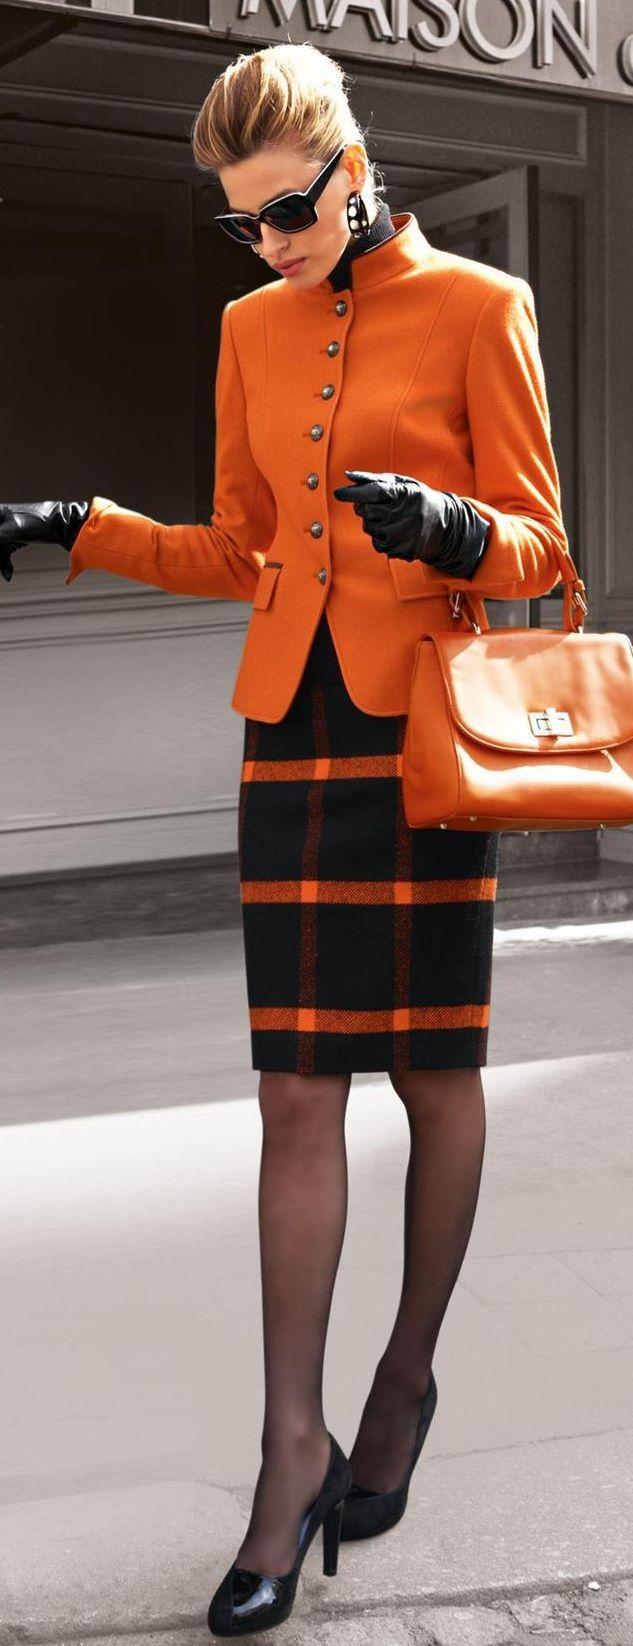 20 Ways ORANGE can reinvigorate your fall wardrobe - Poplistic